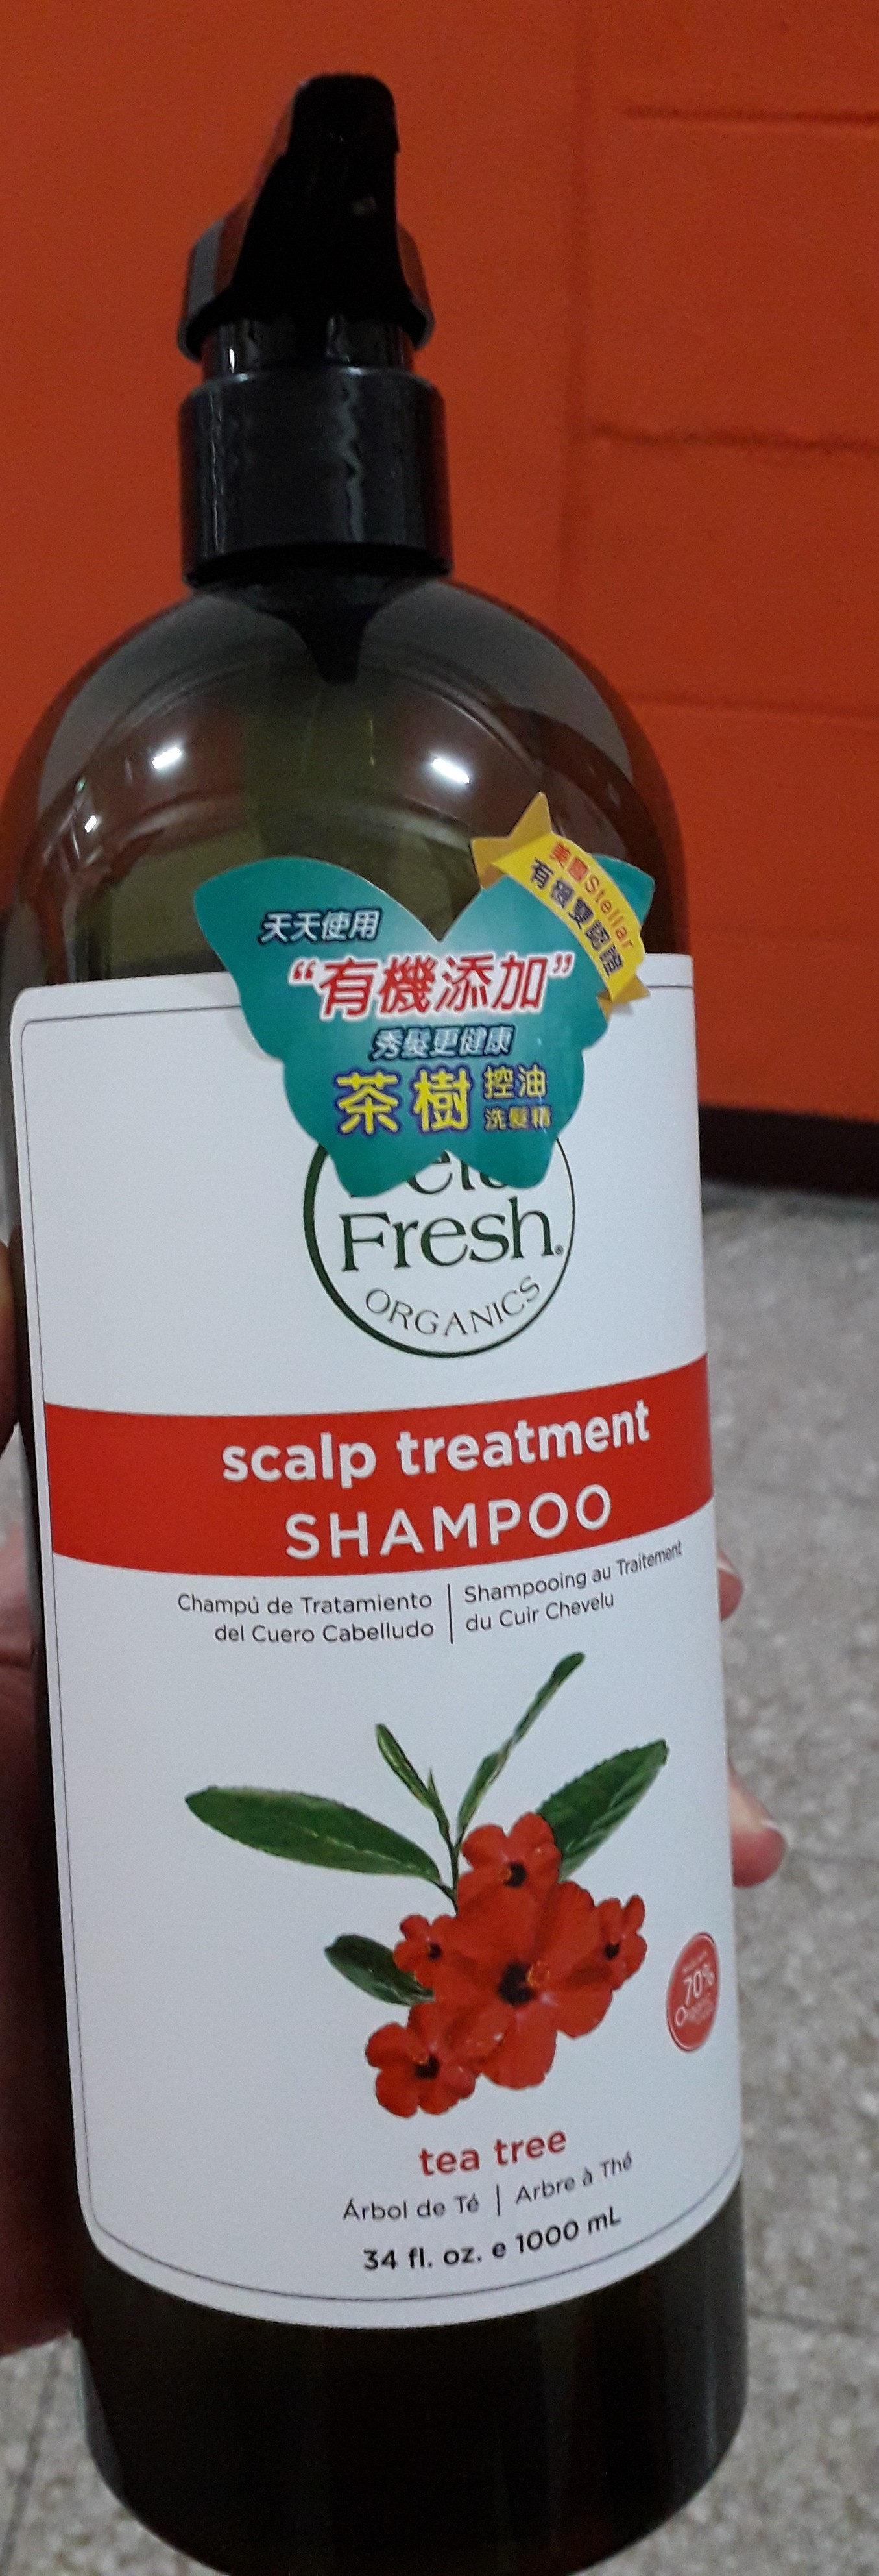 scalp treatment shampoo tea tree - Product